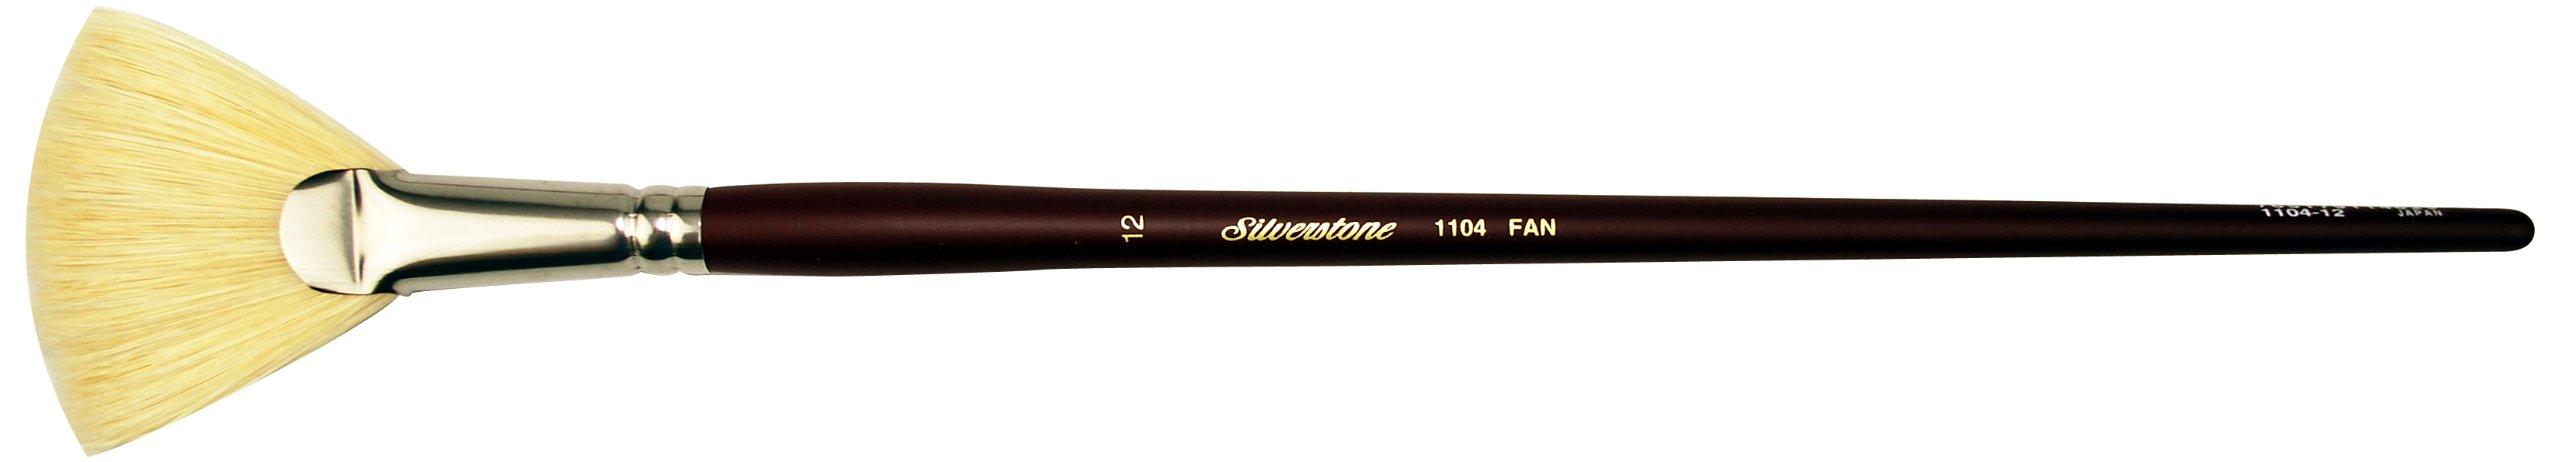 Silver Brush 1104-12 Silverstone Excellent Long Handle Hog Bristle Brush, Fan, Size 12